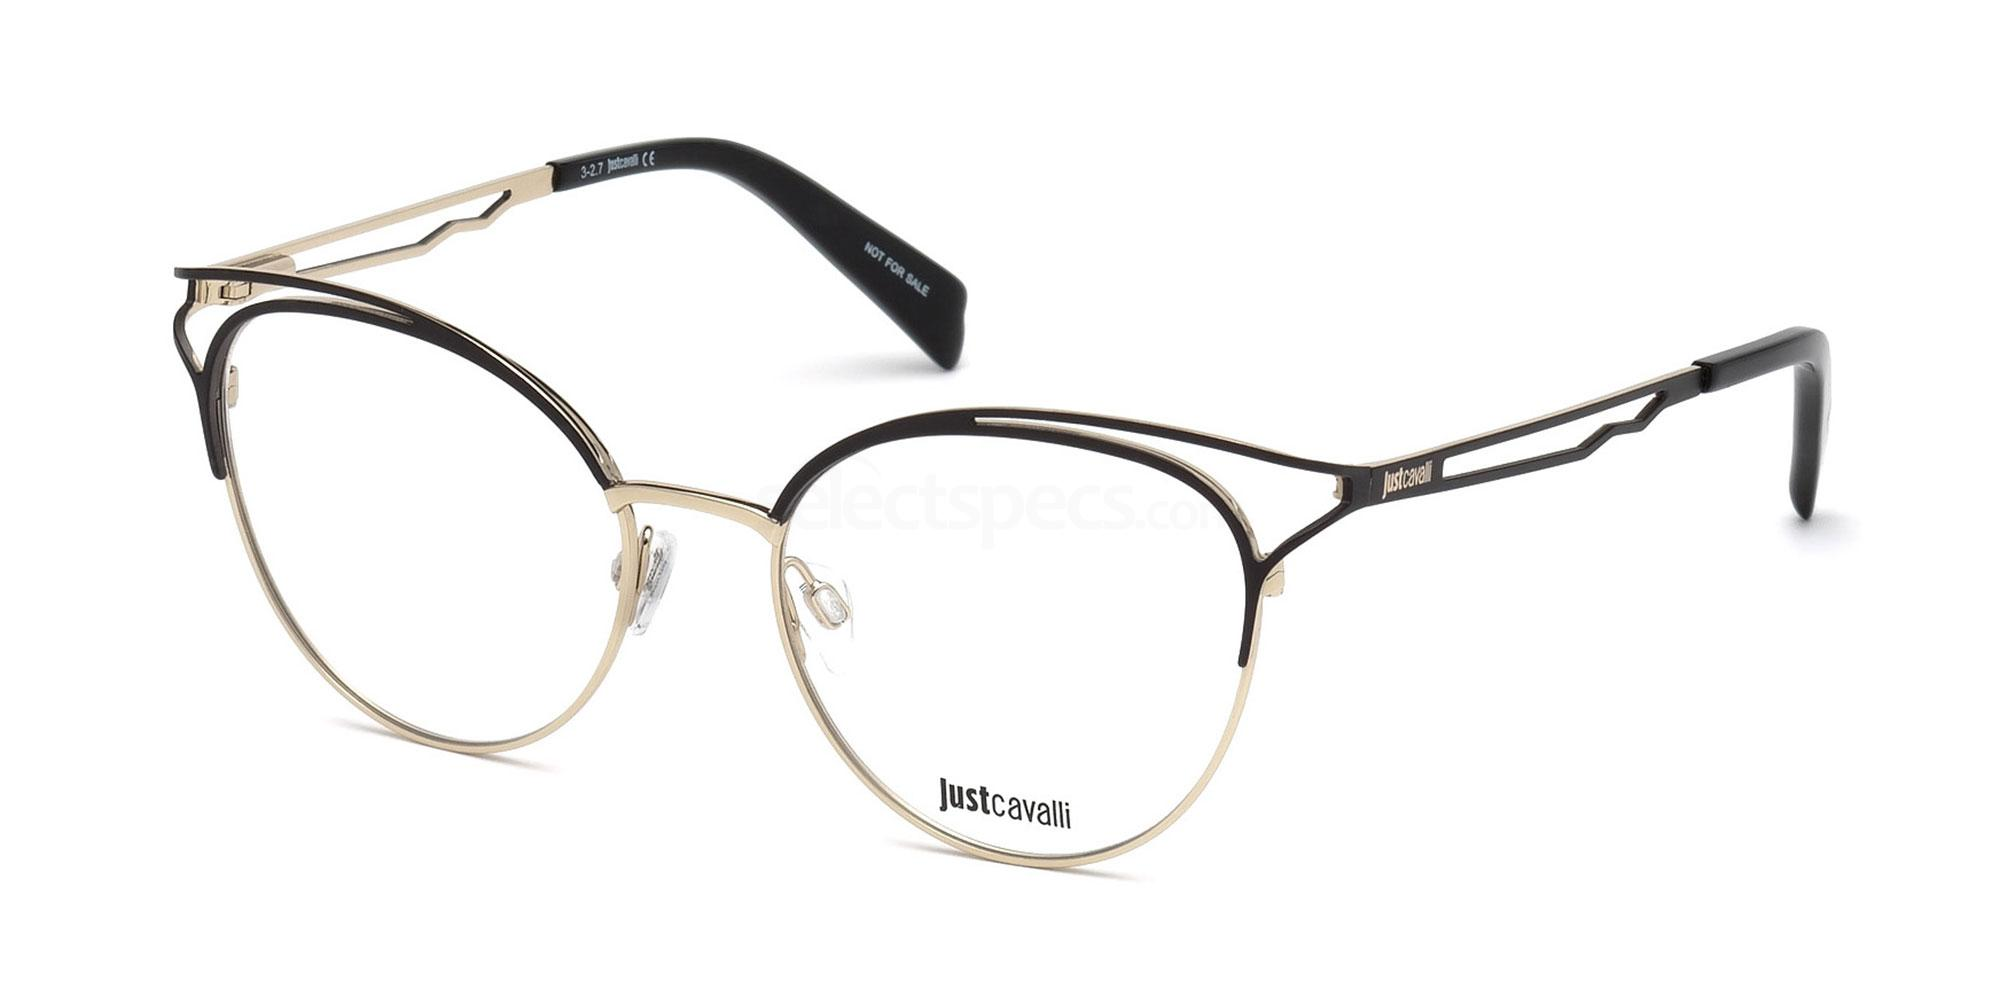 005 JC0860 Glasses, Just Cavalli